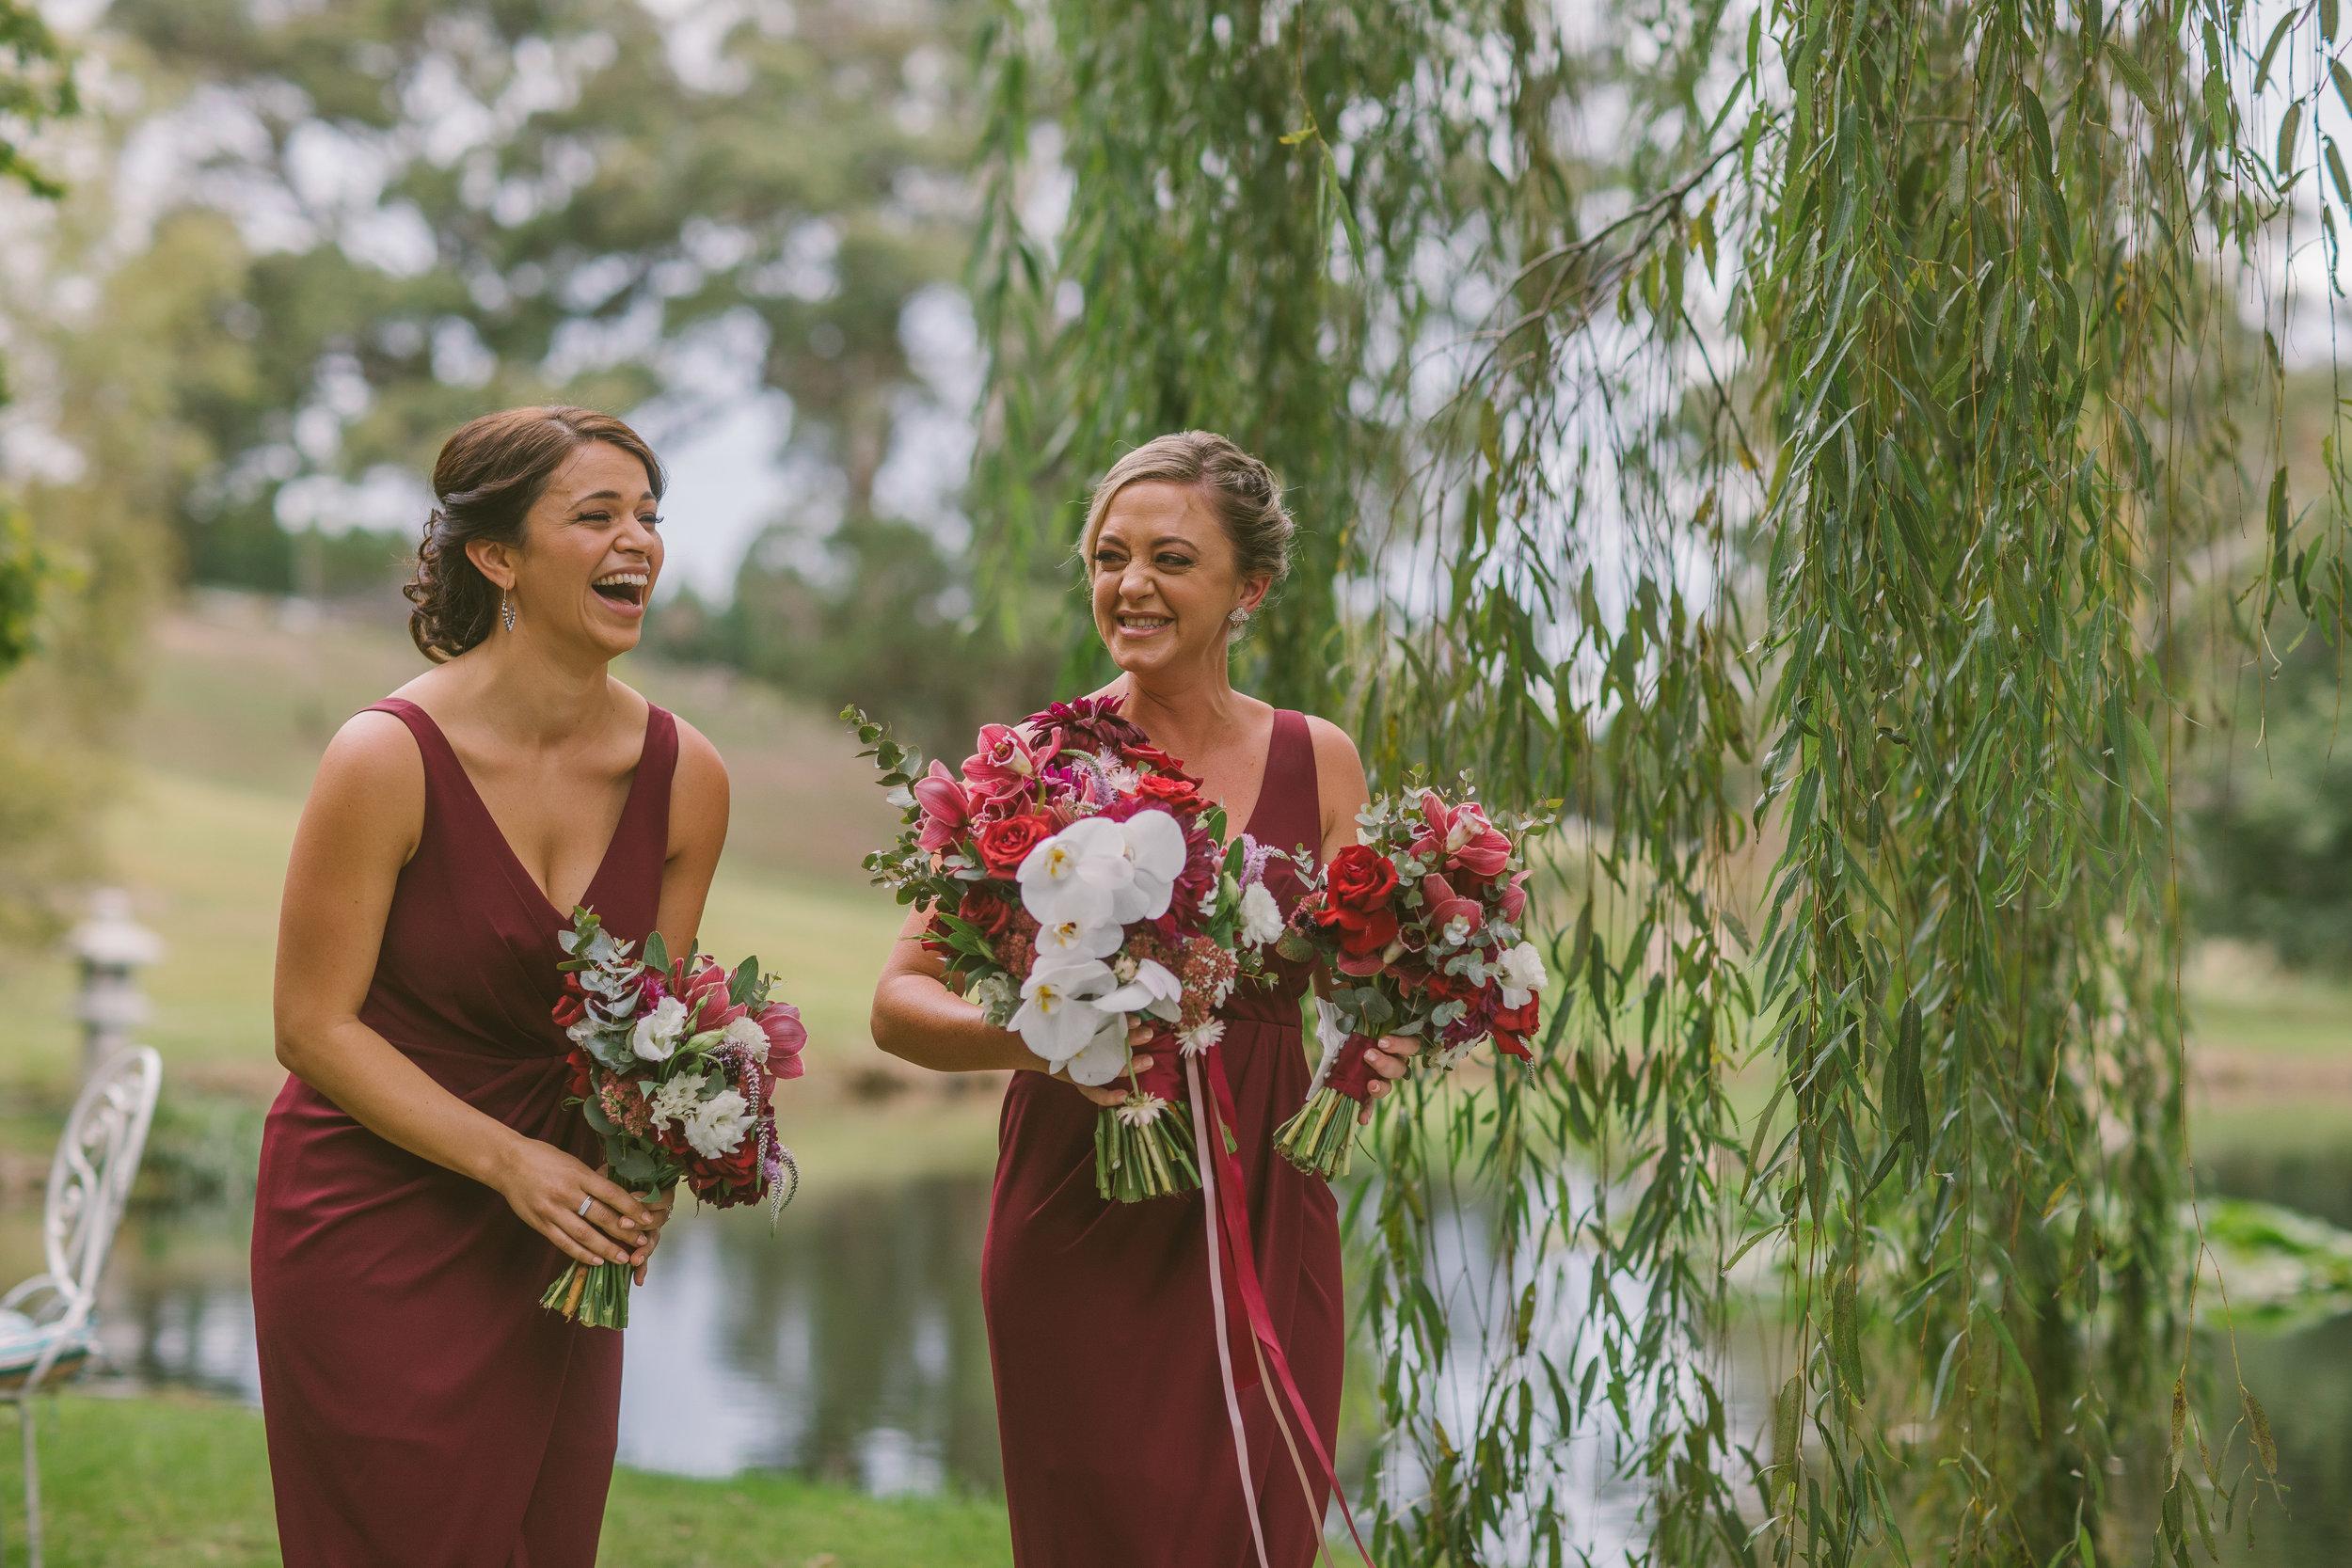 Sarah + Jason - Mali Brae Farm Wedding Photographer - Magnus Agren Photography-0262.jpg